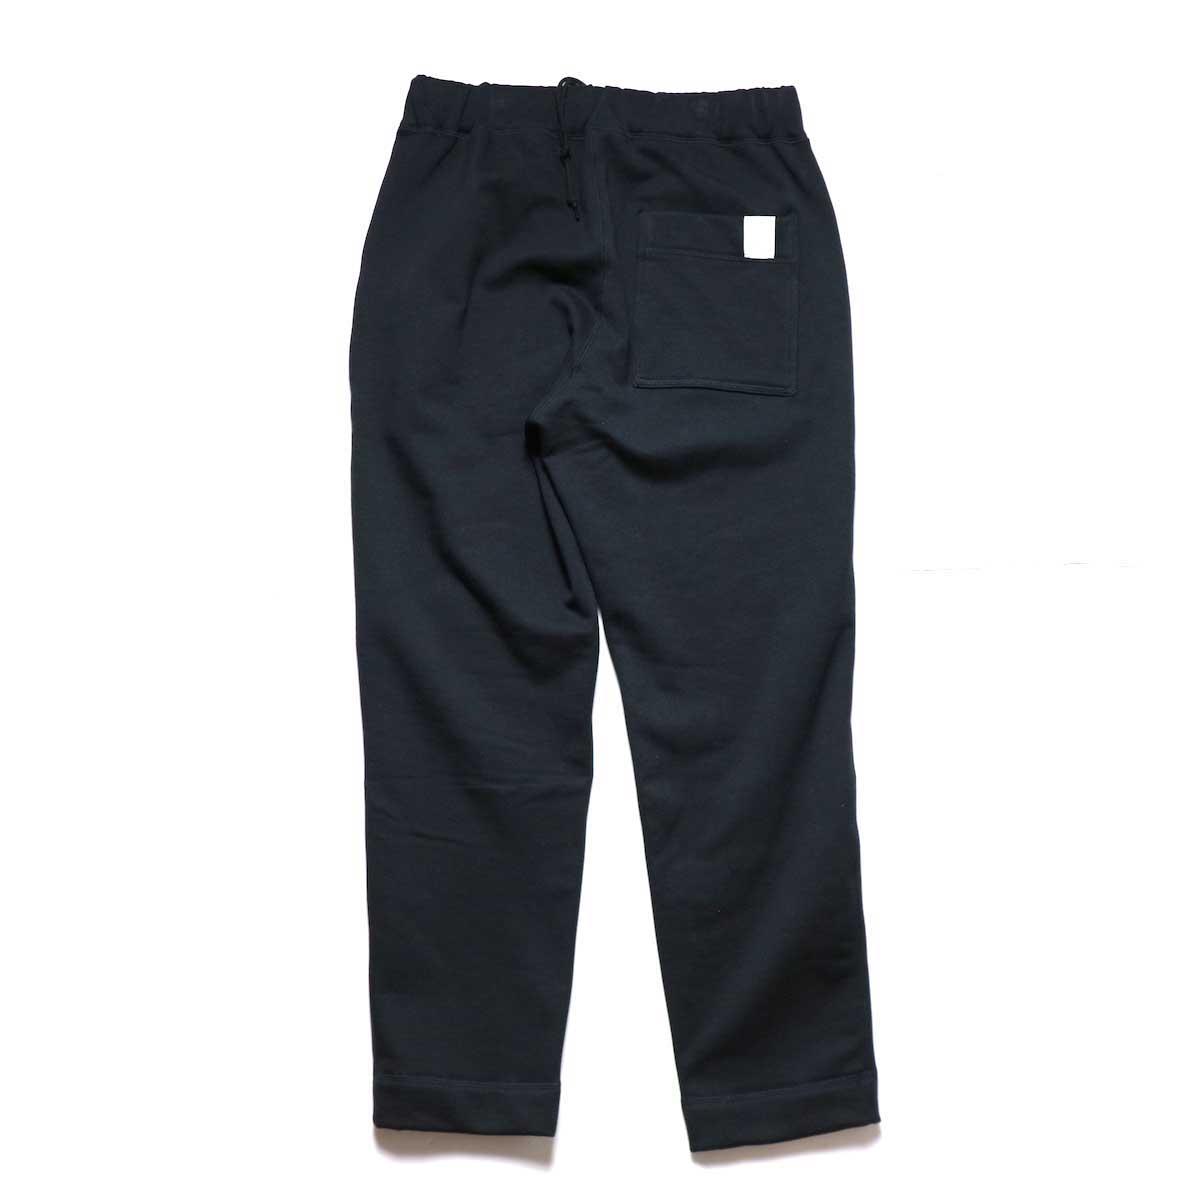 N.HOOLYWOOD / 27RCH-013 Track Pants (Black)背面